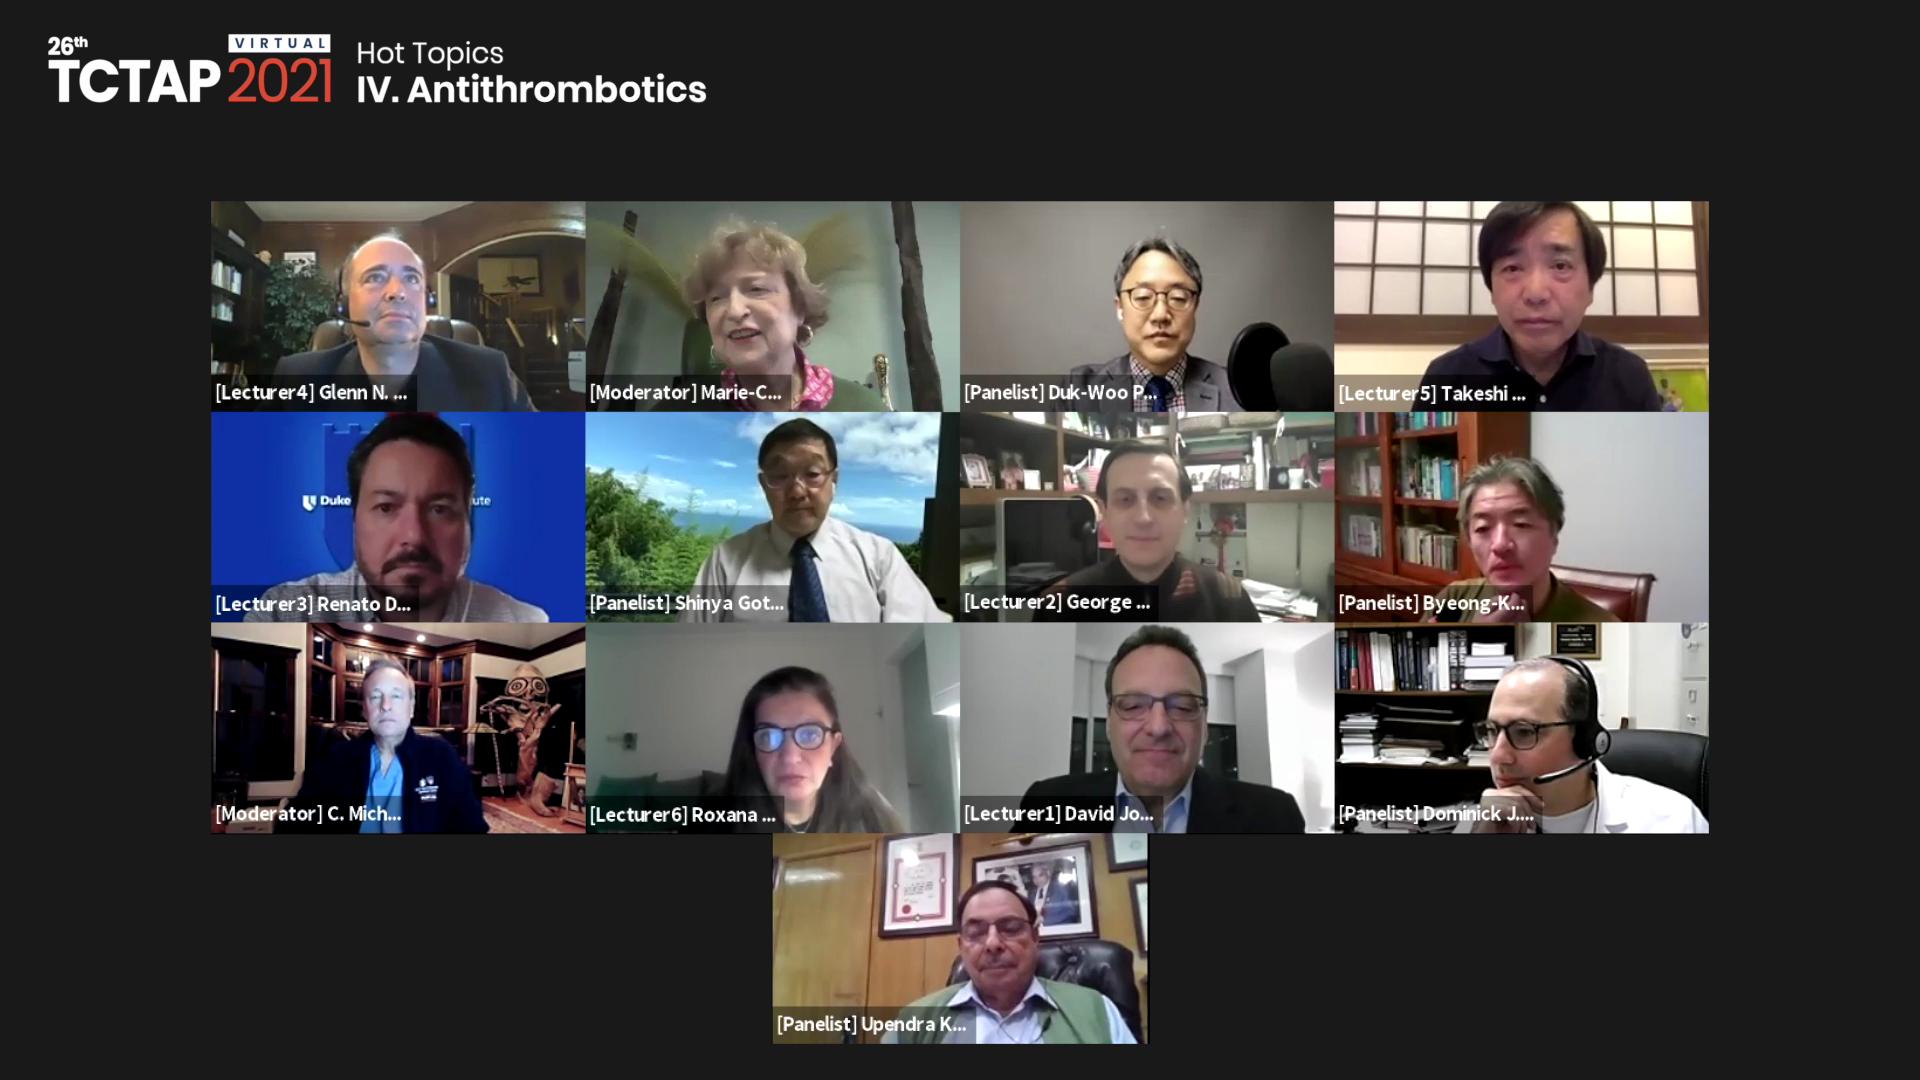 [TCTAP 2021 Virtual] Hot Topics - IV. Antithrombotics